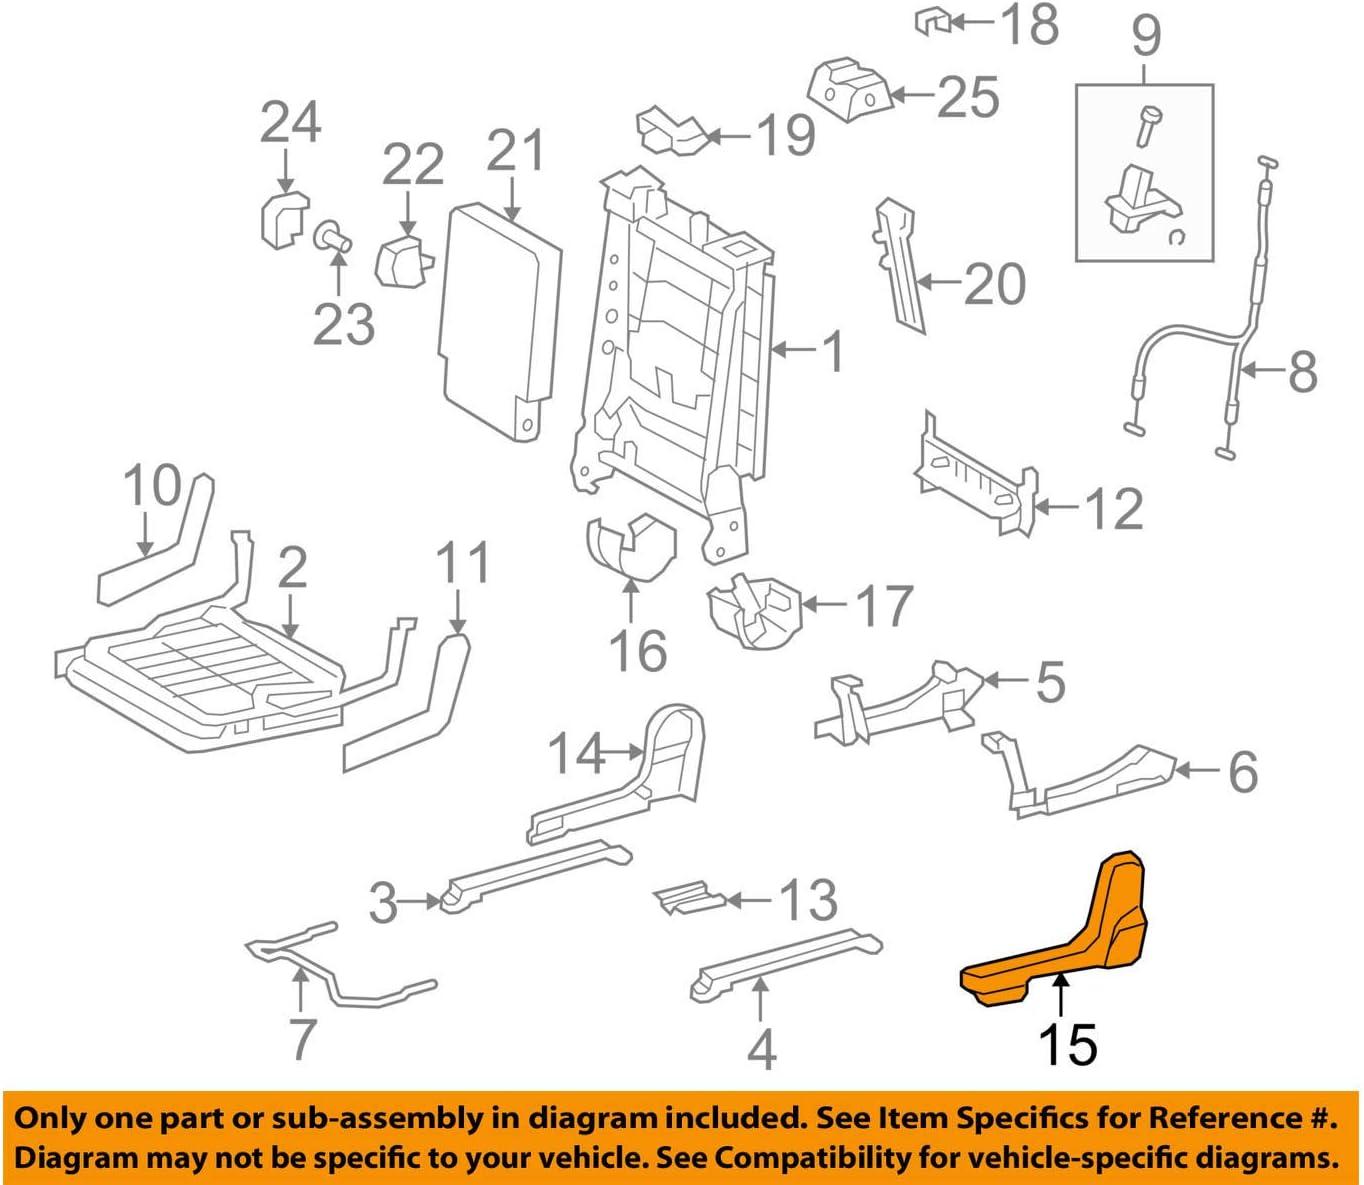 TOYOTA 71396-0C010-B0 Seat Hinge Cover